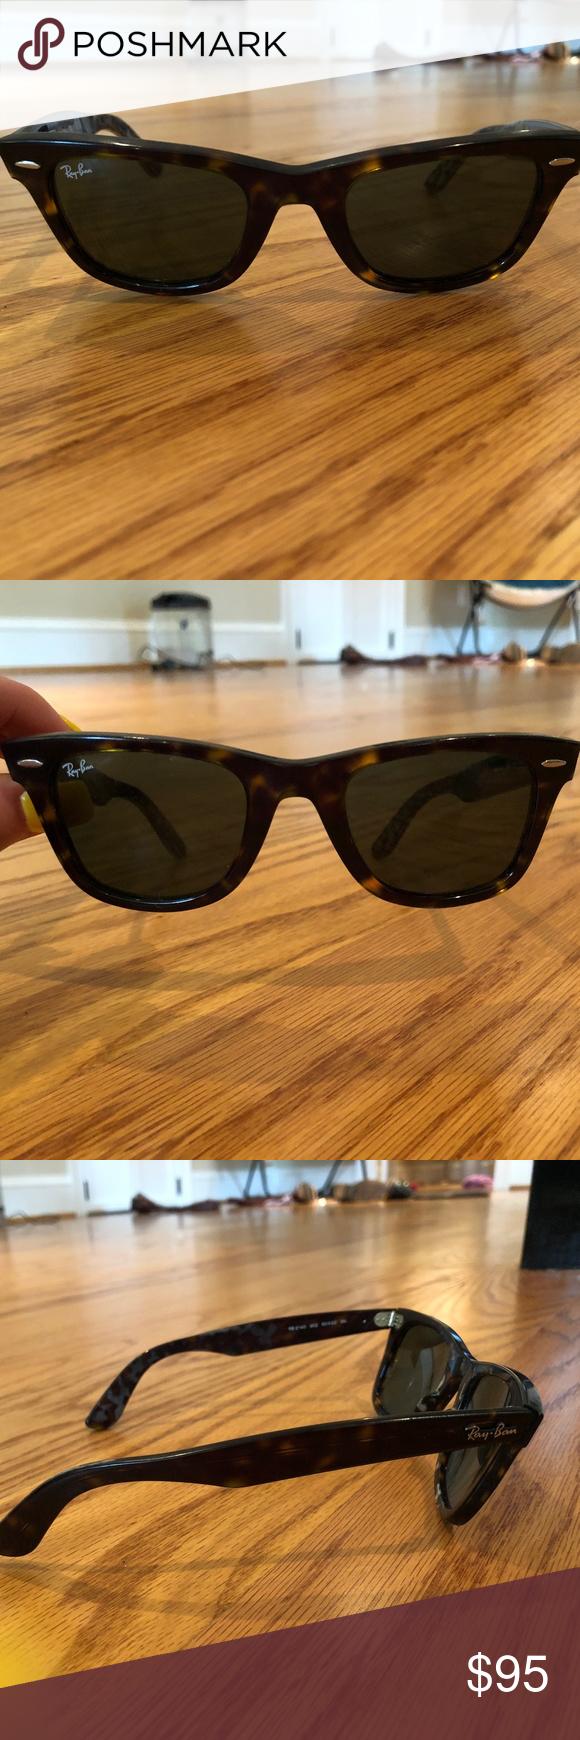 8560c5a3f5 Lenses  Green Classic G-15. Model Code  Model code  RB2140 902 50-22 in  perfect shape Ray-Ban Accessories Sunglasses. ORIGINAL WAYFARER ...